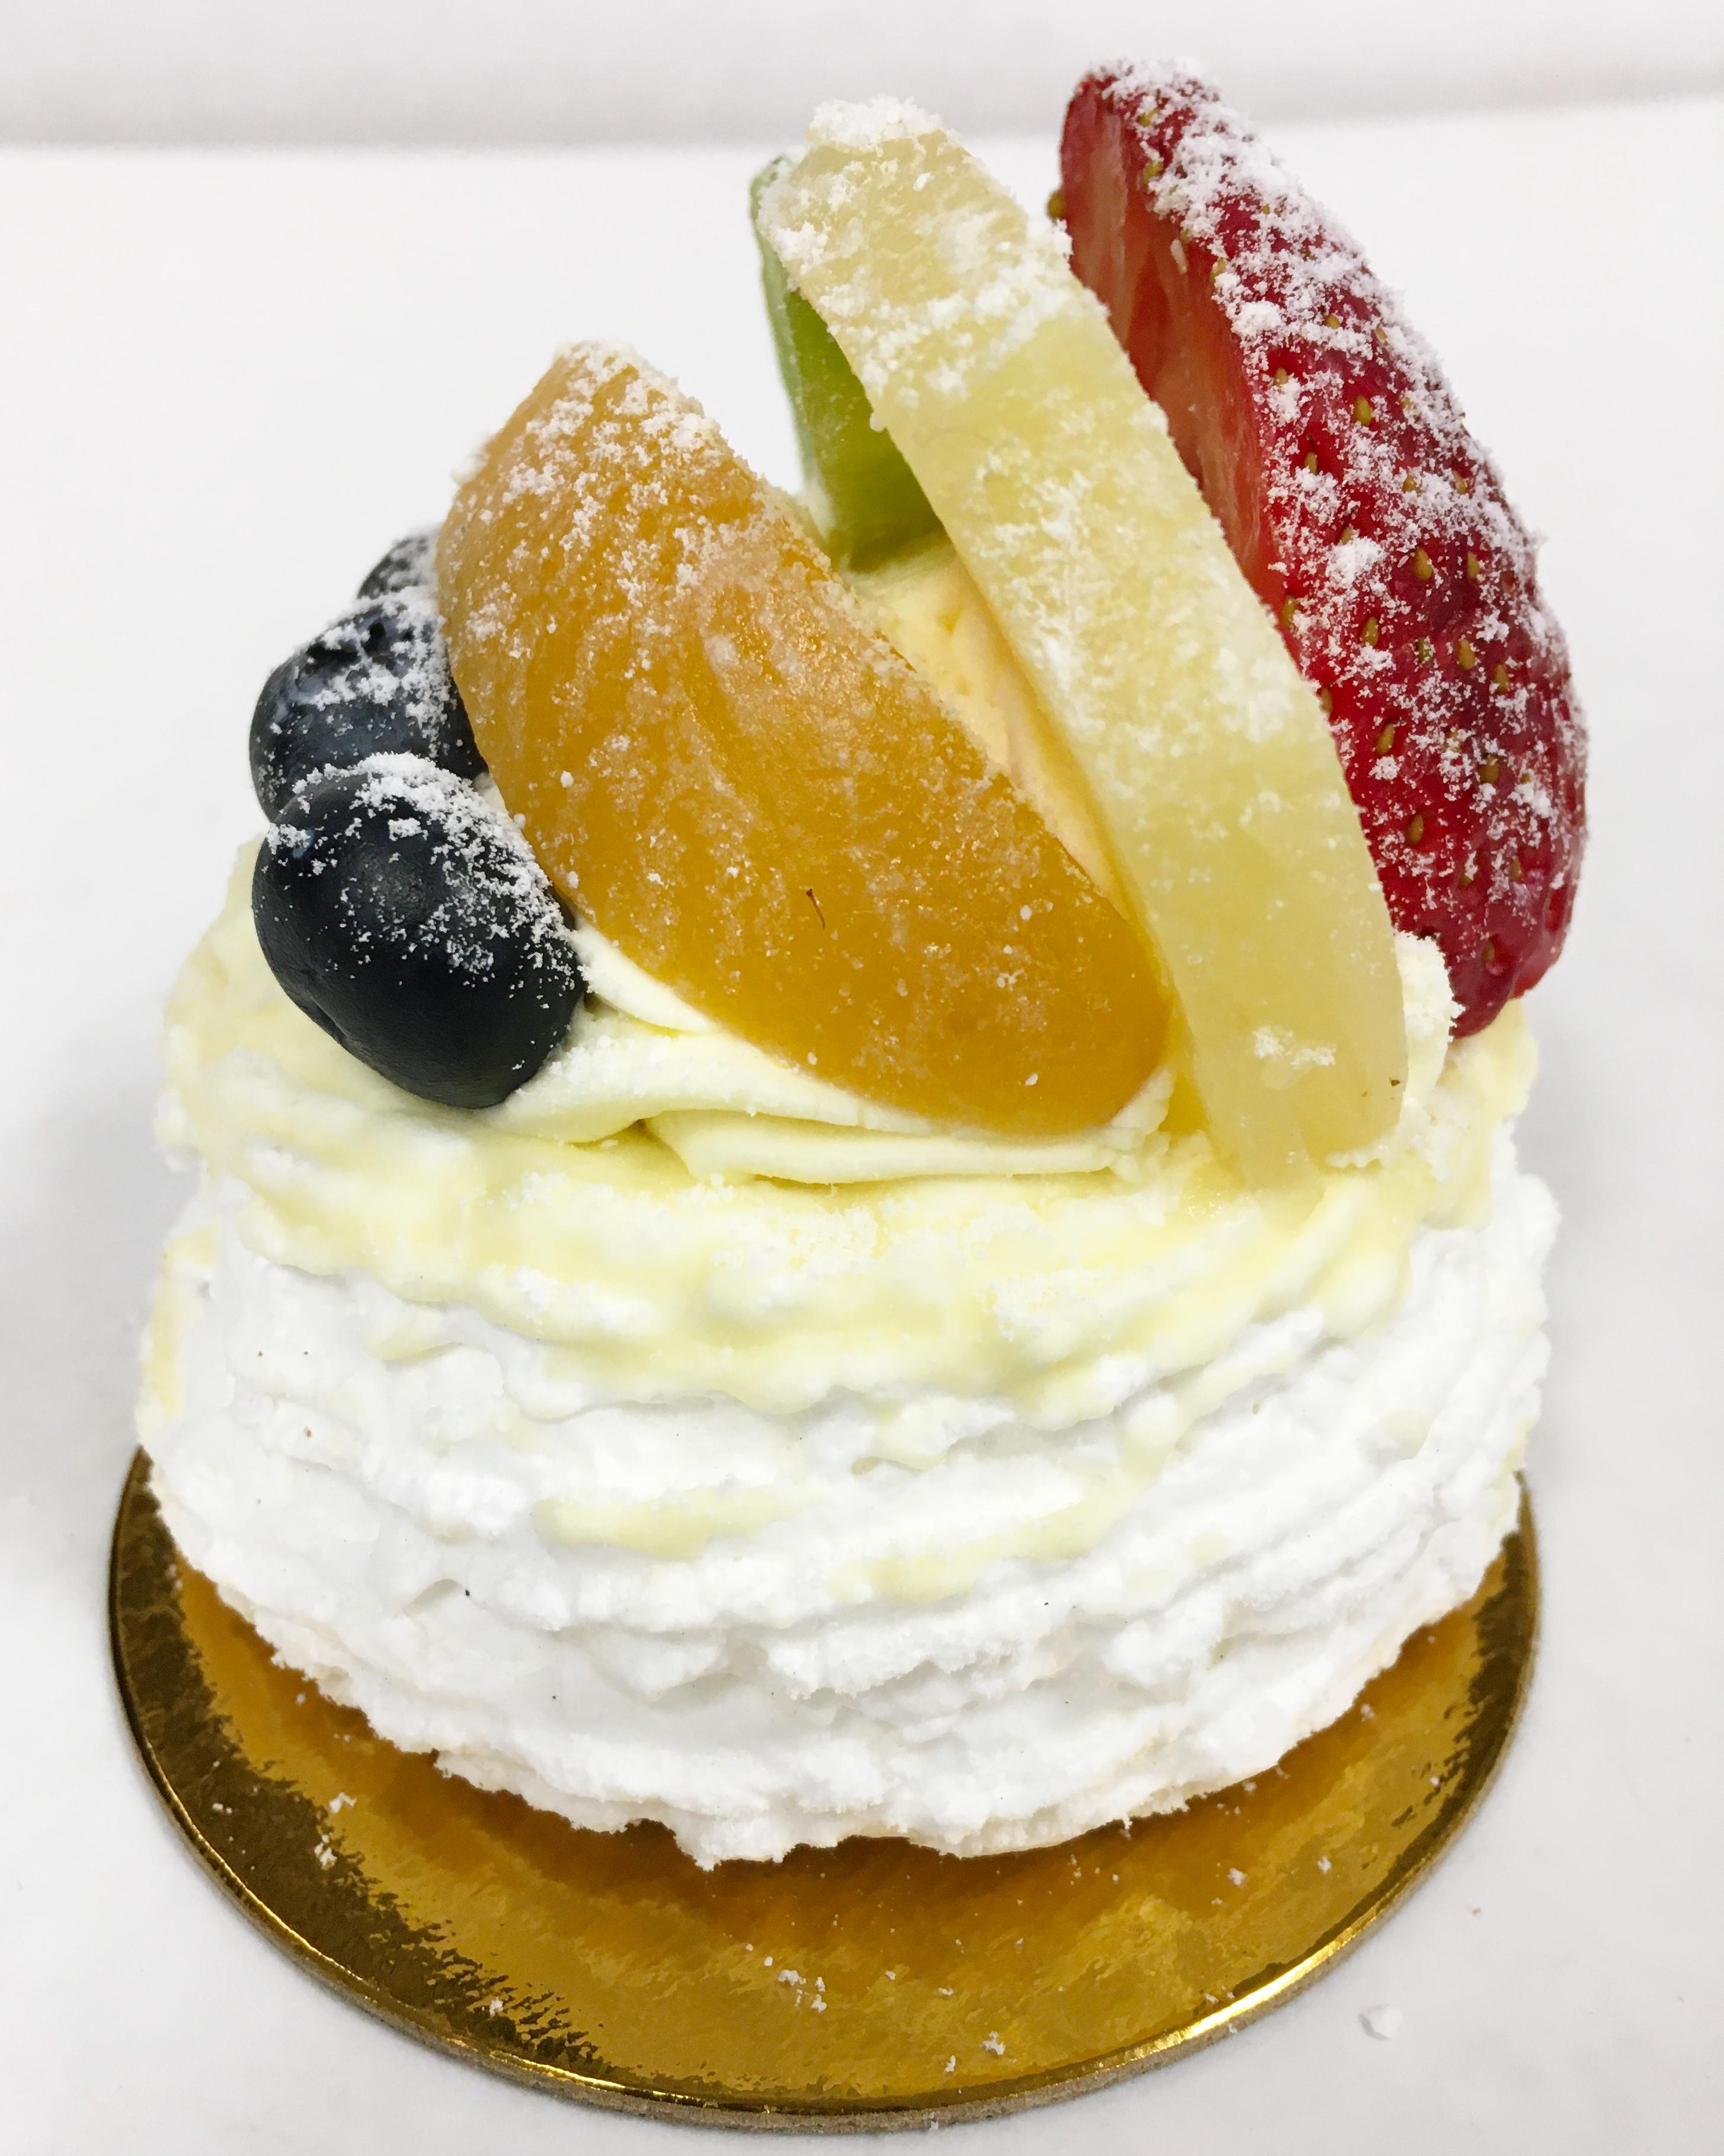 Meringue Bavarian Cream Pastry